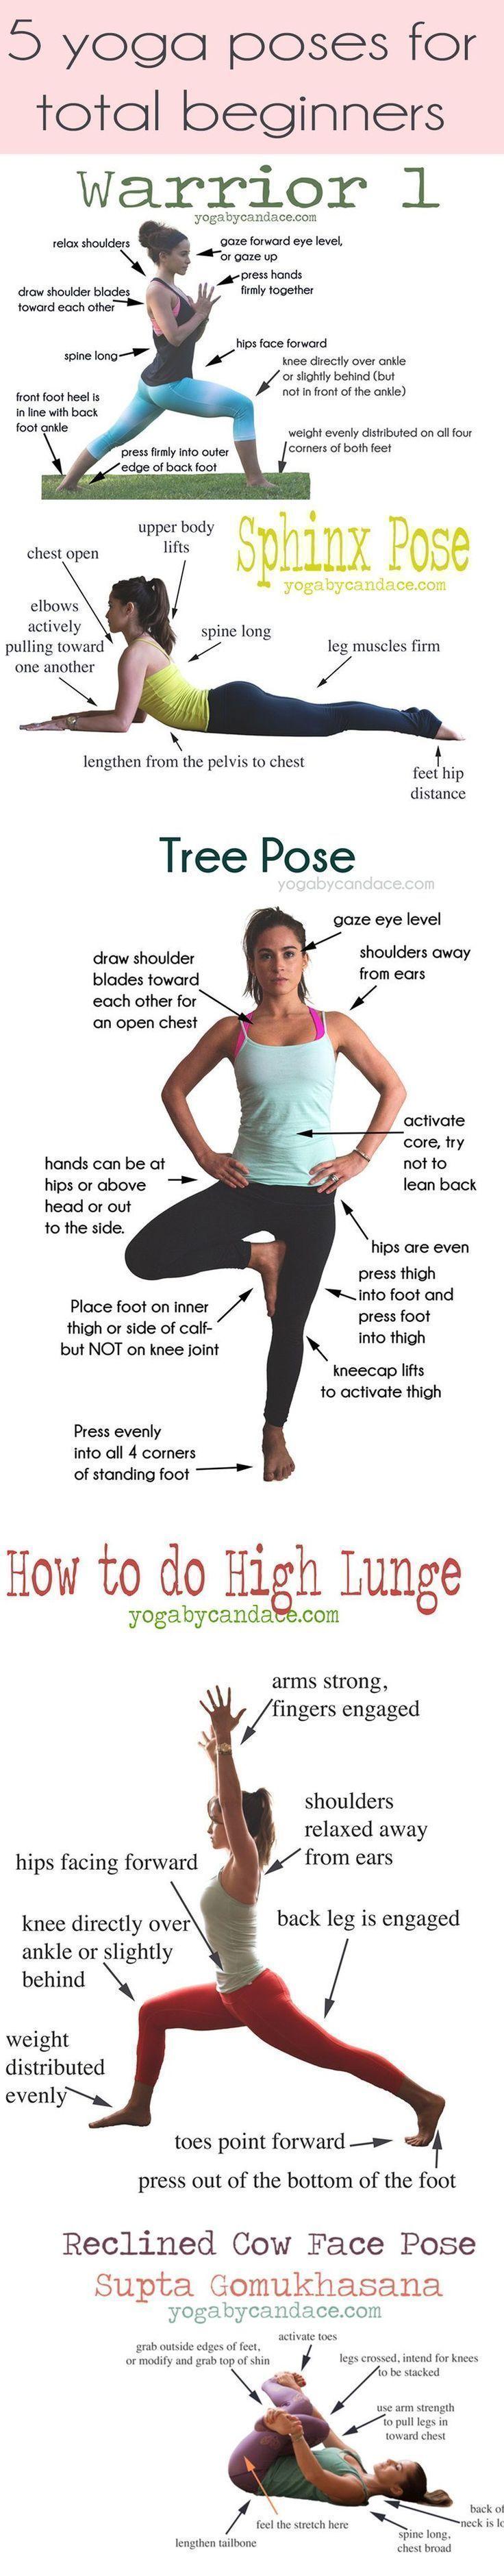 Yoga For Beginners Hot Pants Vinyasa Workout Girl Flexibility Weight Loss Body Shorts